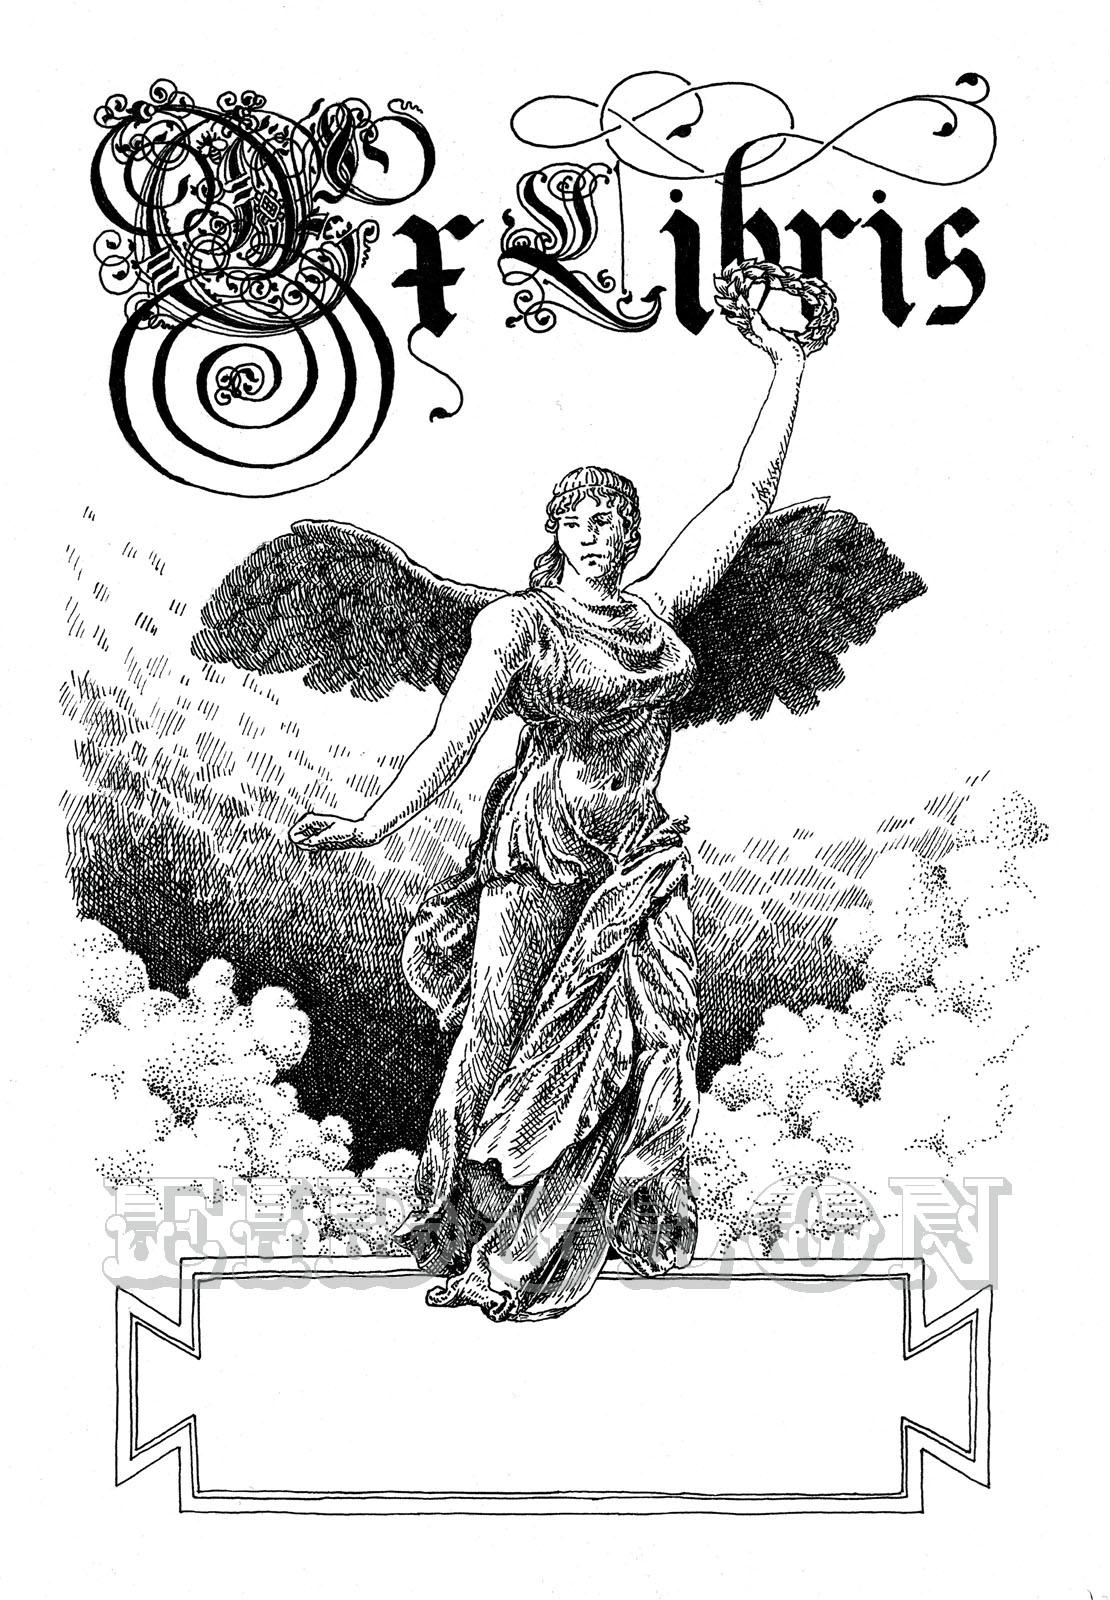 Ex Libris etsy 2.jpg